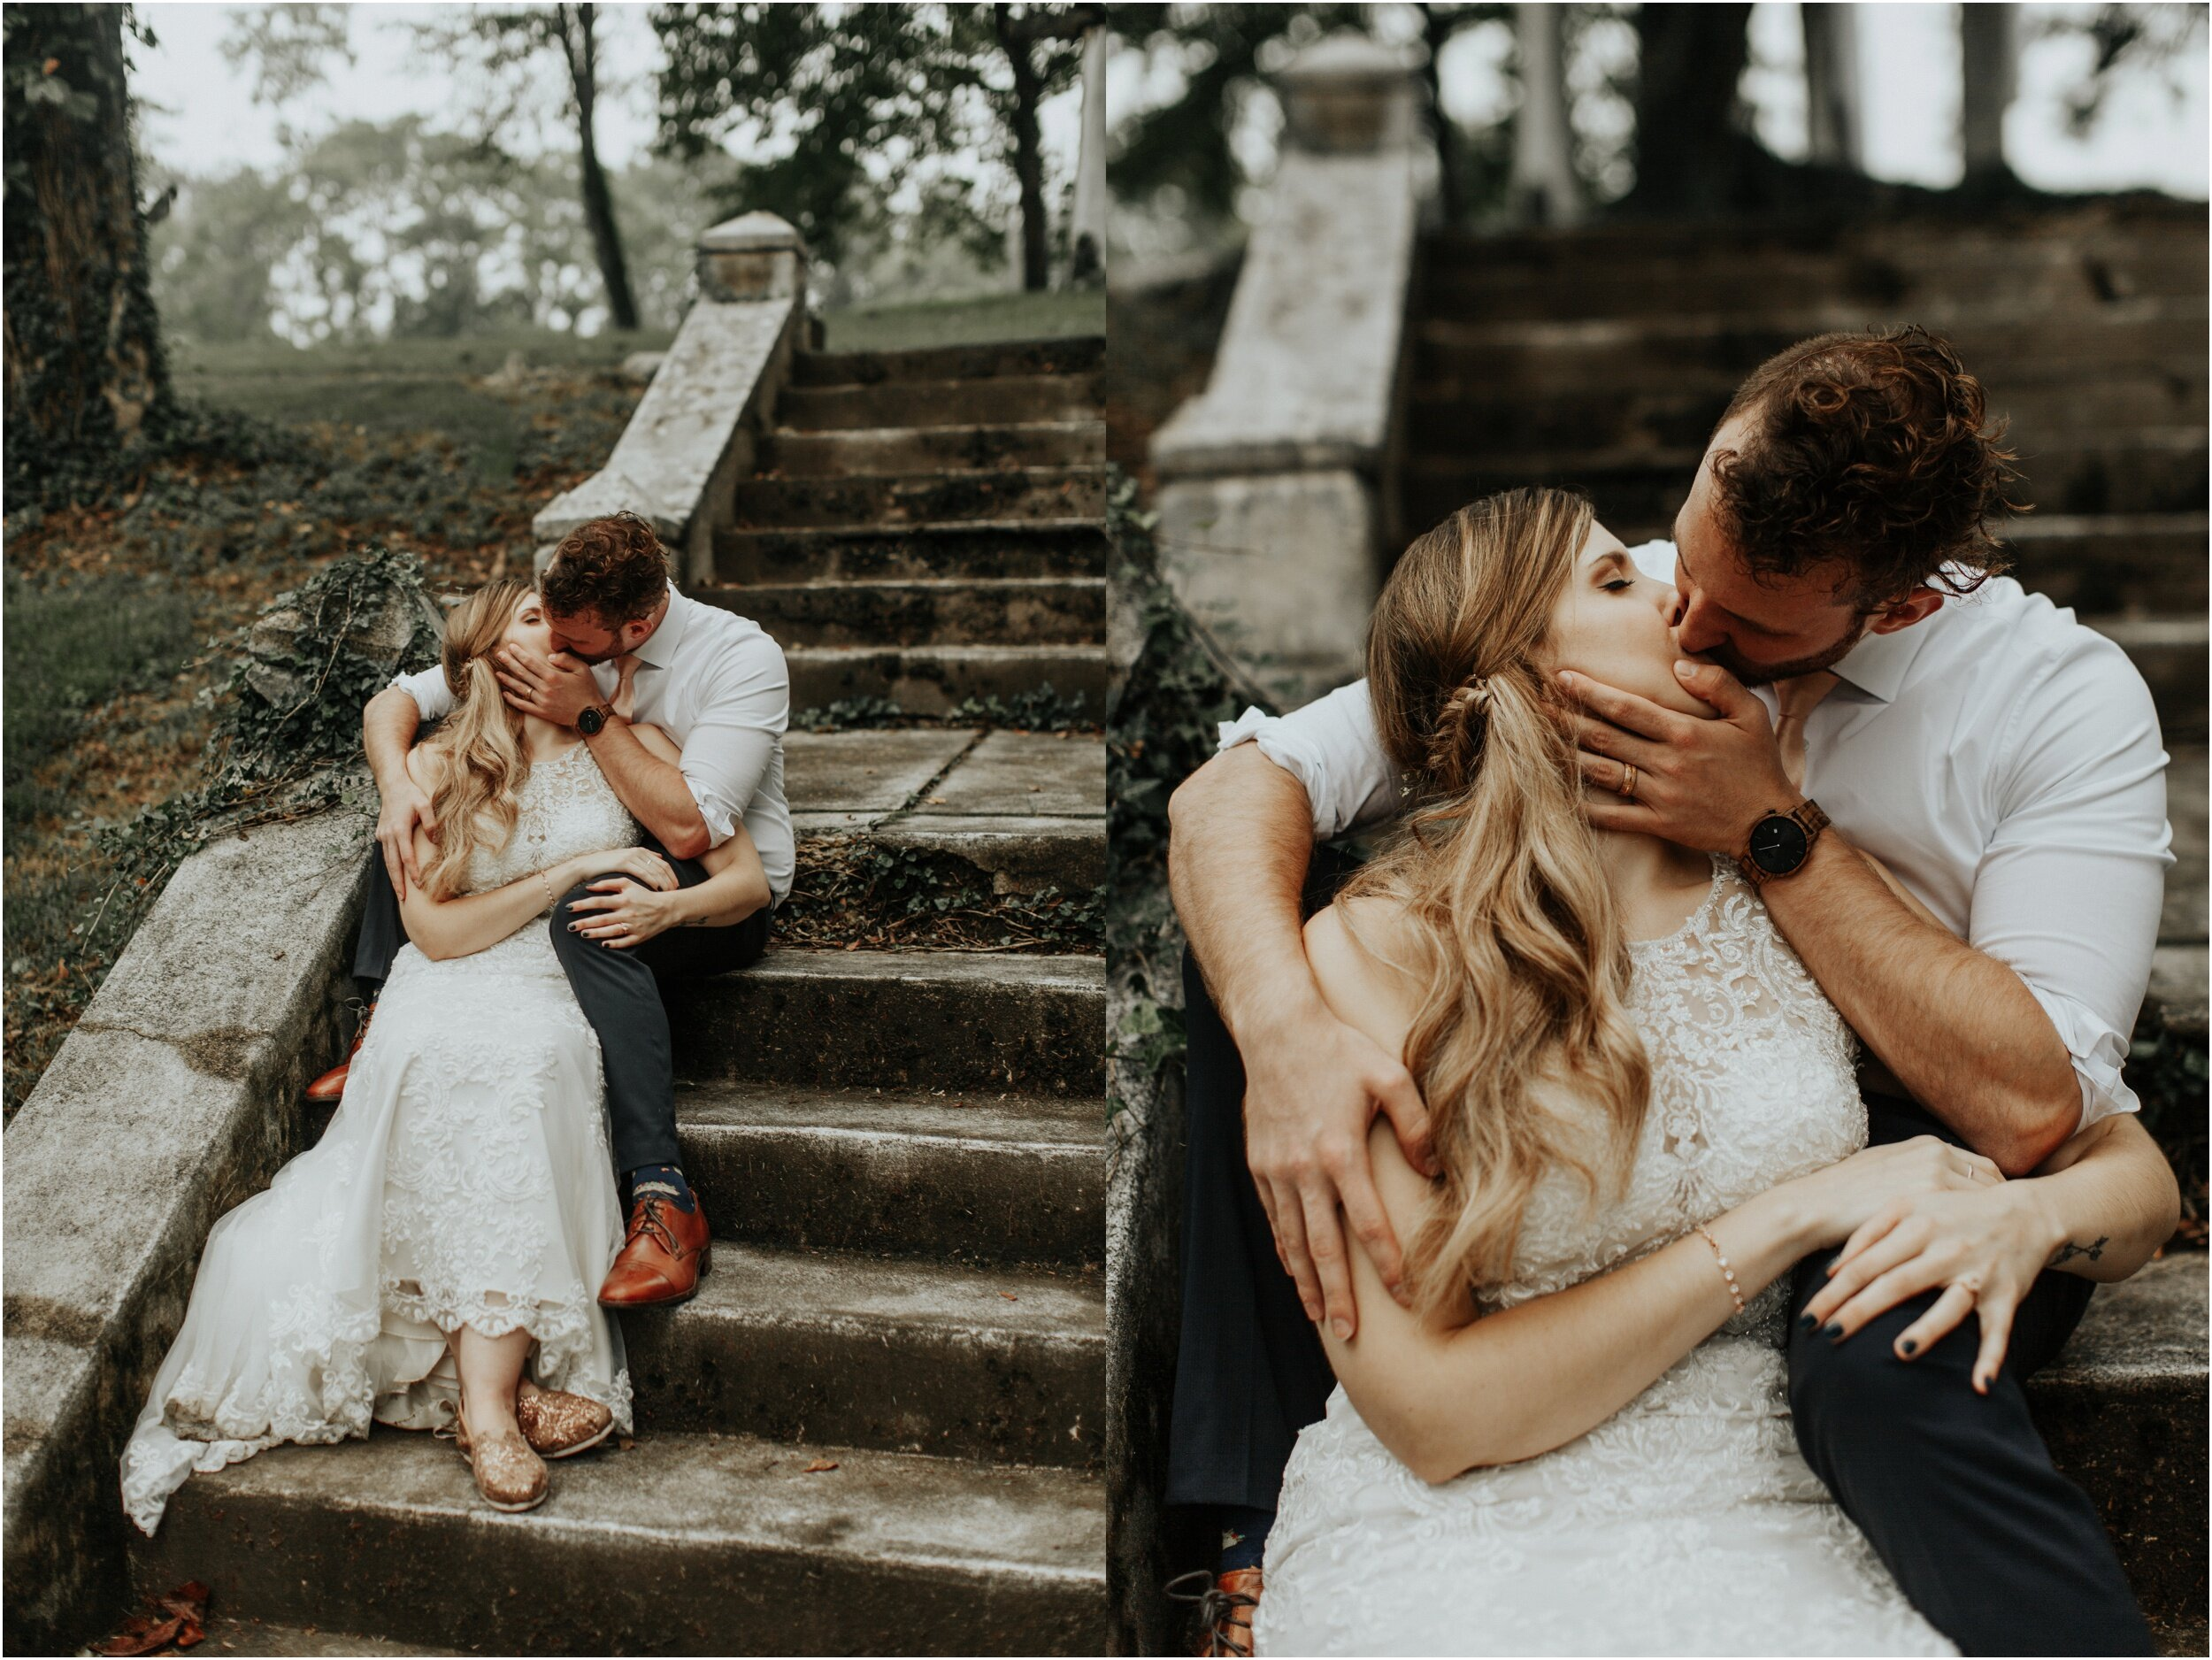 steph-and-jordan-cox-our-wedding-historic-shady-lane-compass-wedding-collective-hazel-lining-photography-destination-elopement-wedding-engagement-photography_0073.jpg